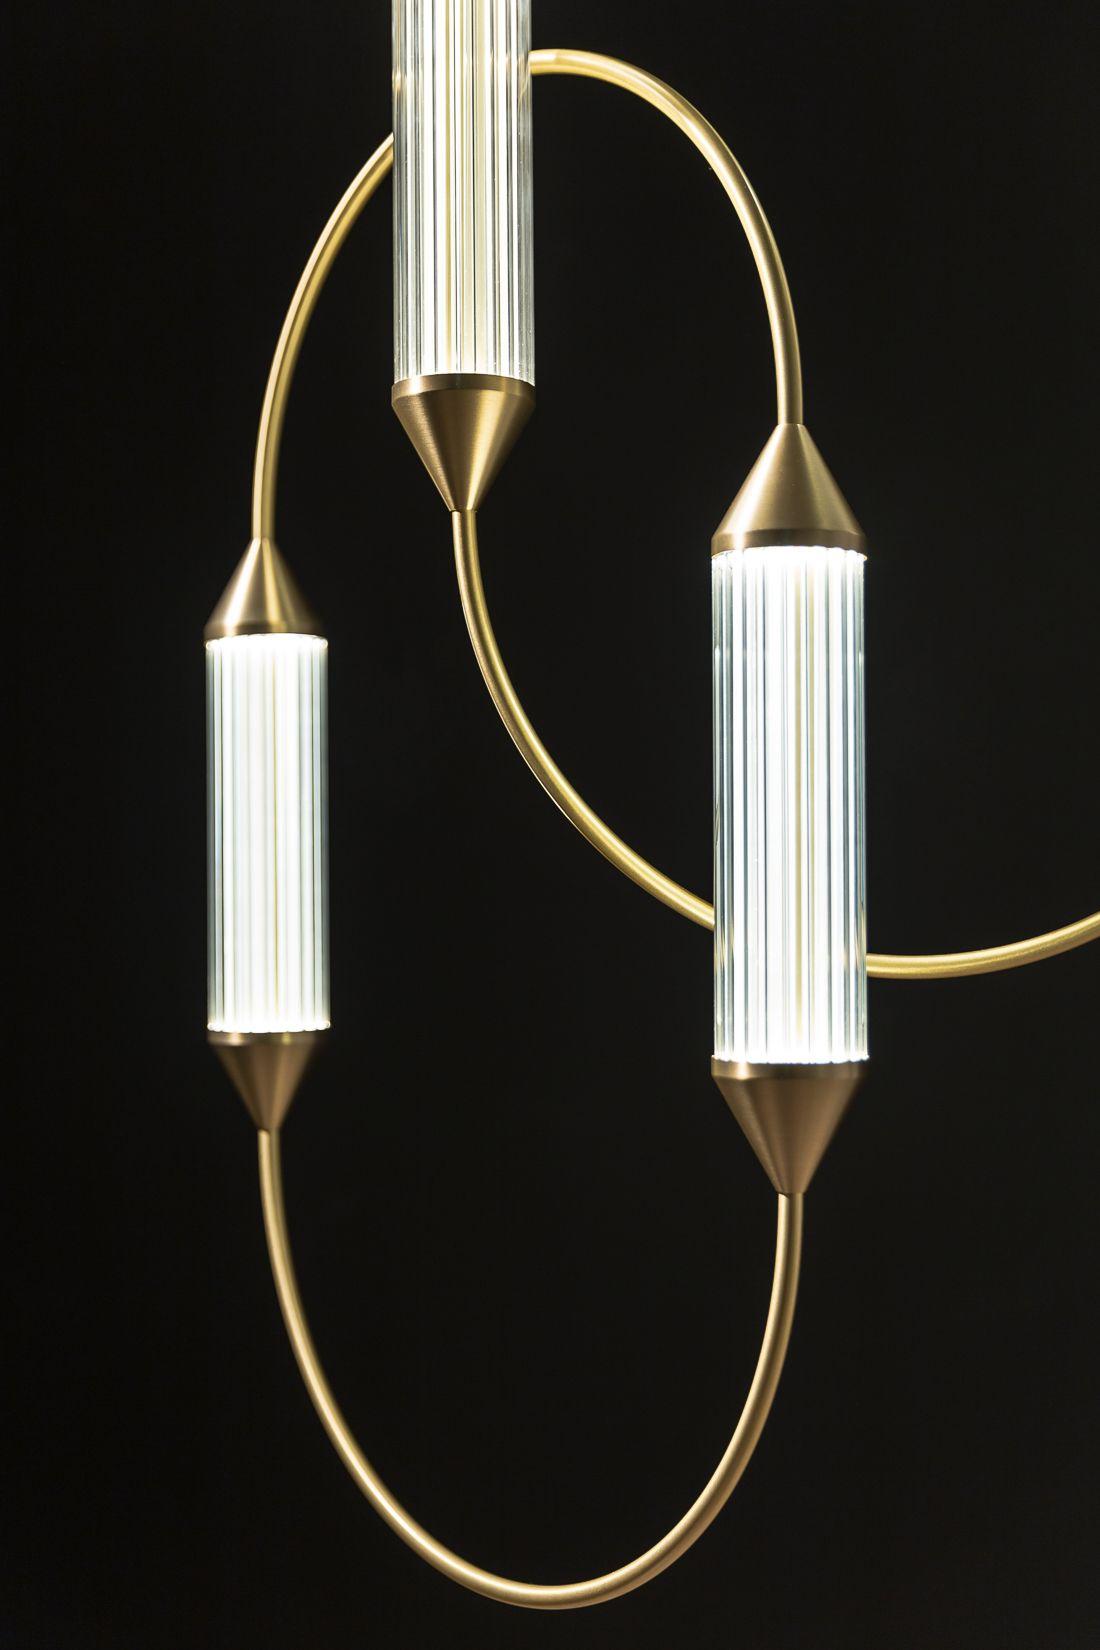 Sculptural Ornamental Lighting From